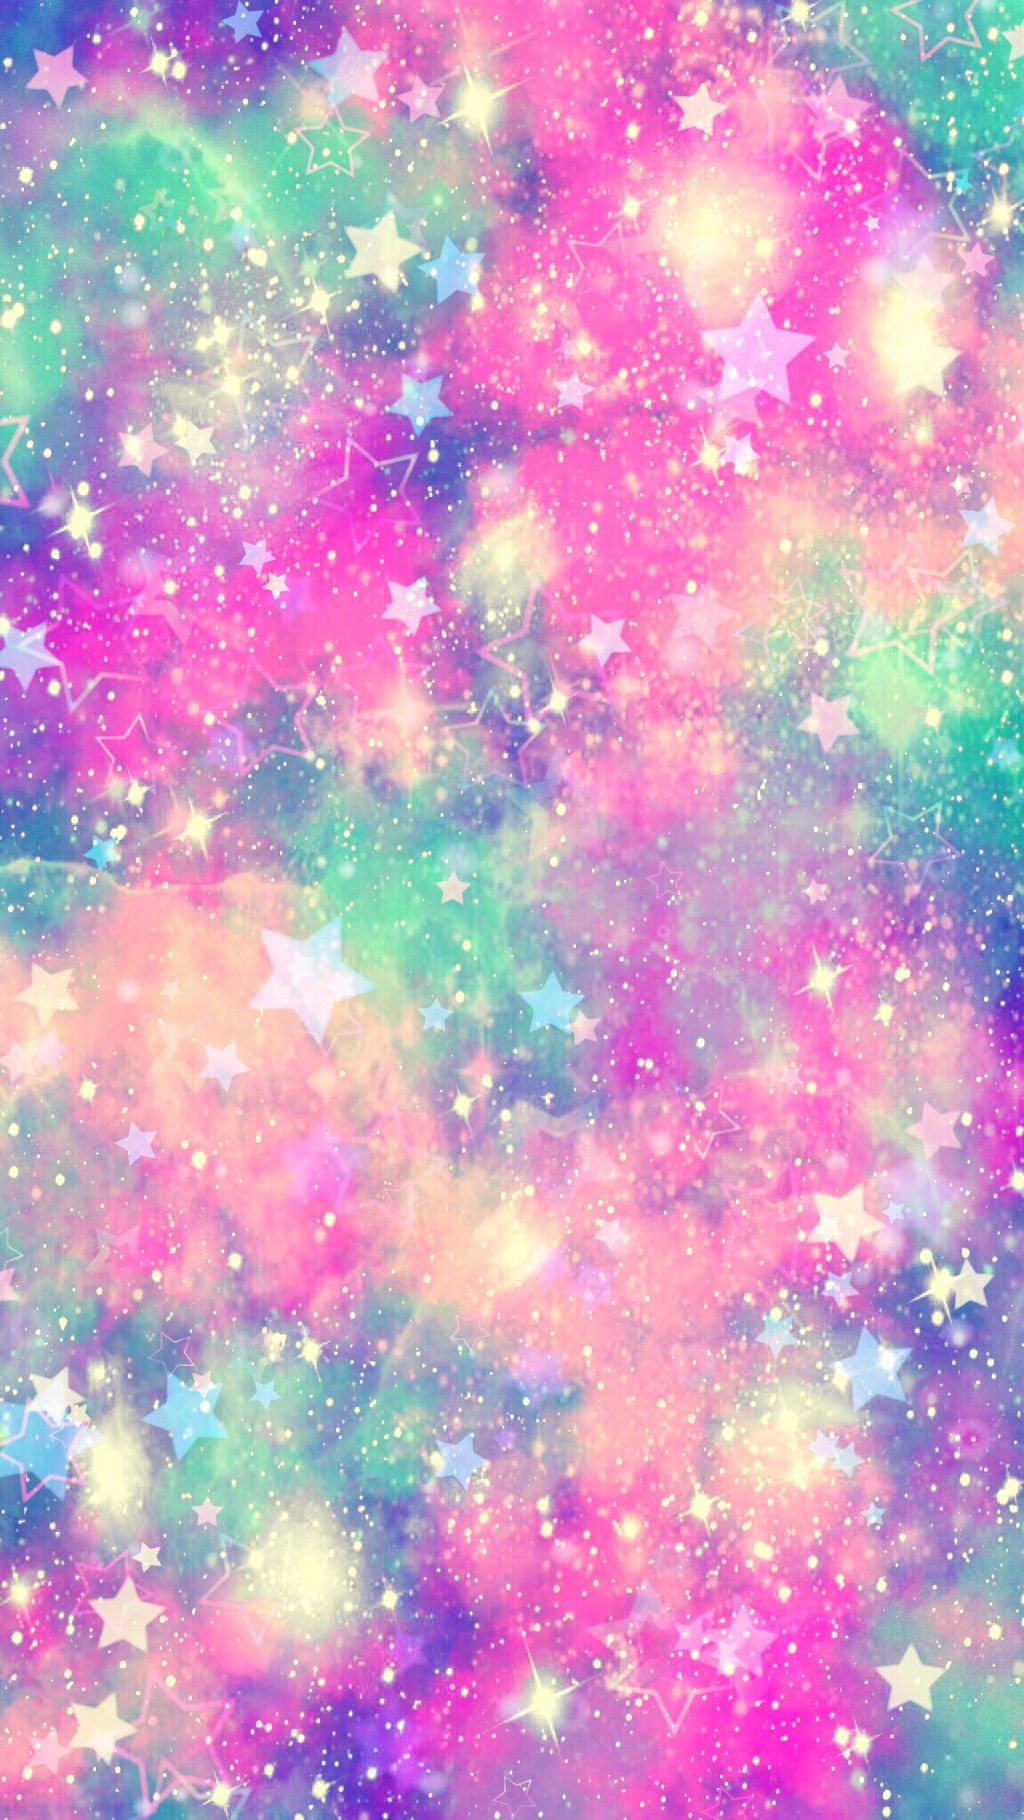 Freetoedit Glitter Galaxy Sparkle Pastel Rainbow Unicorn Wallpaper Phone 1024x1820 Wallpaper Teahub Io